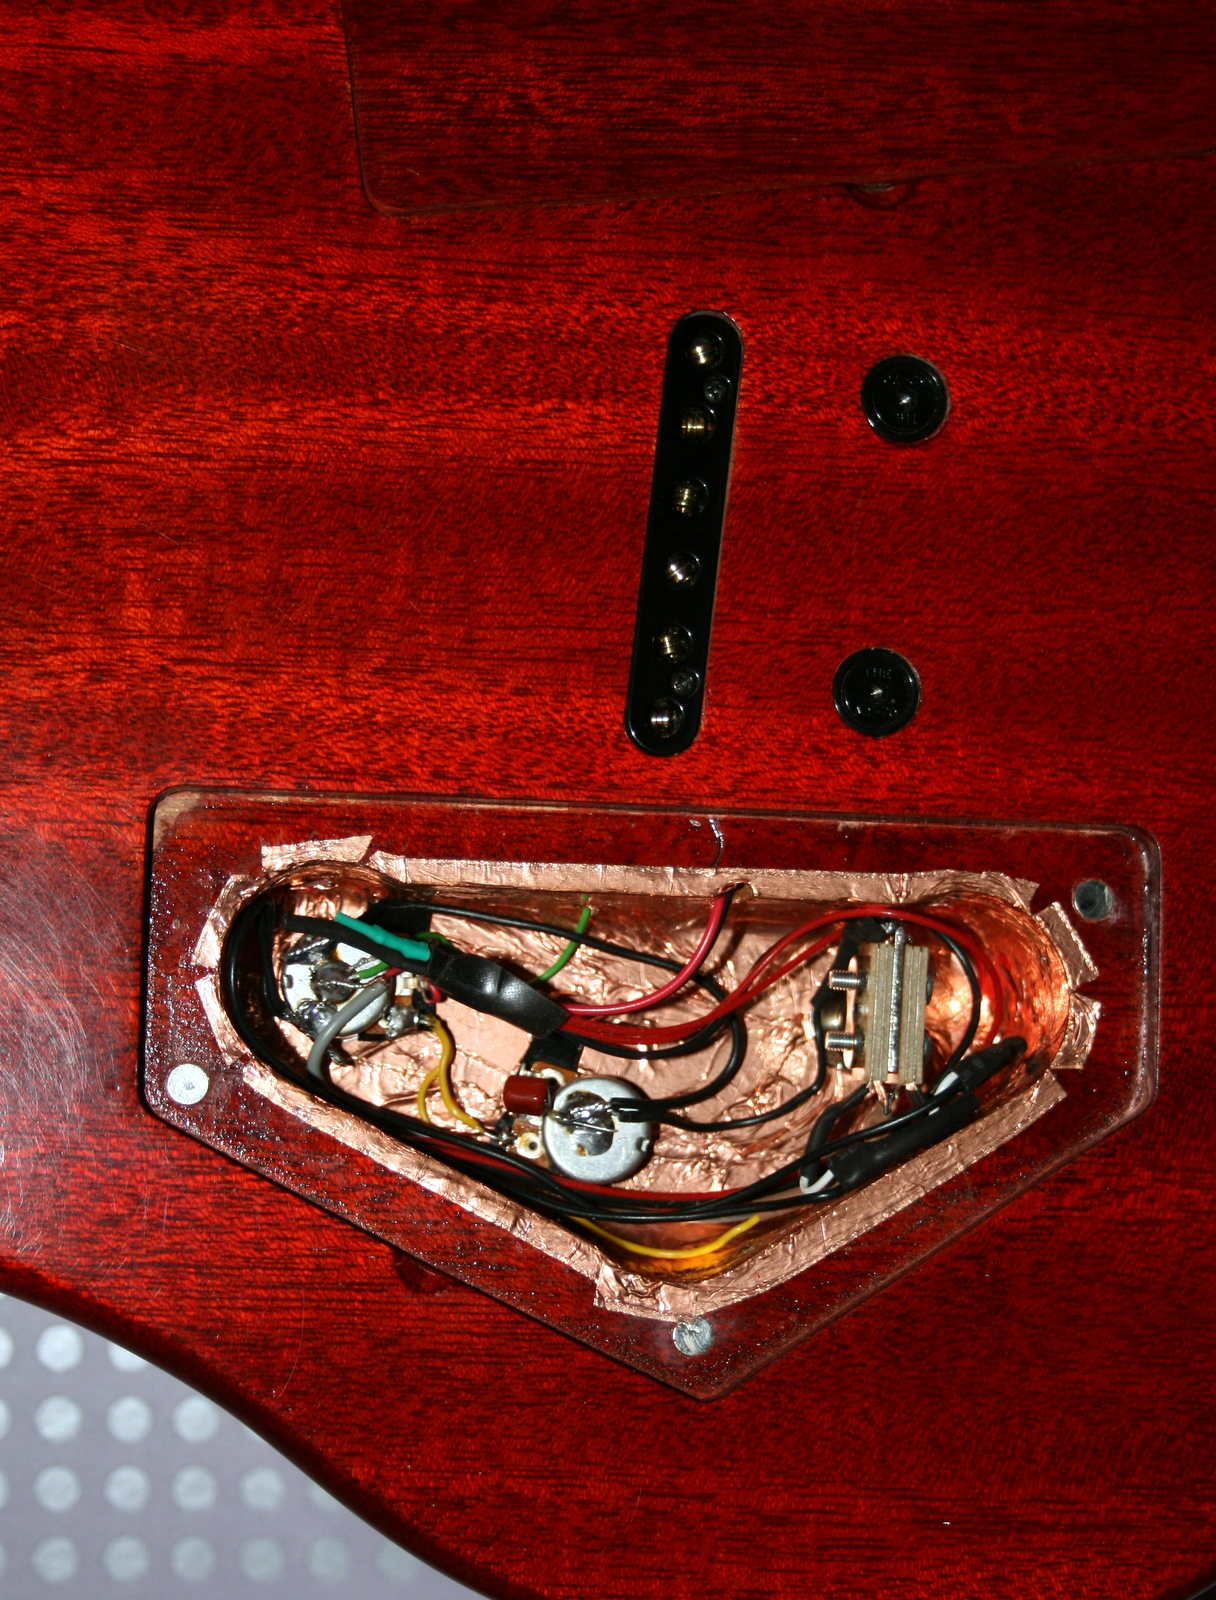 tmc woodworks baritone guitar build part 9 completion. Black Bedroom Furniture Sets. Home Design Ideas